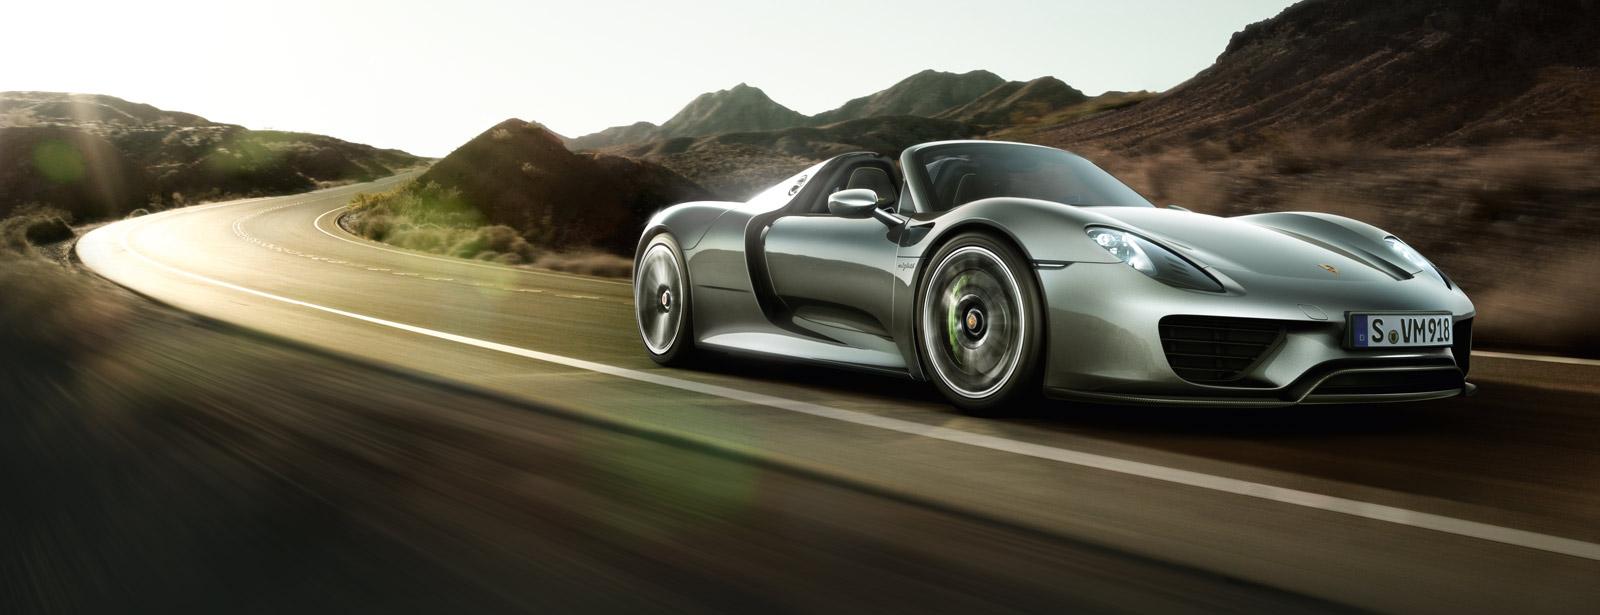 10 most powerful cars in the world - Porsche 918 Spyder